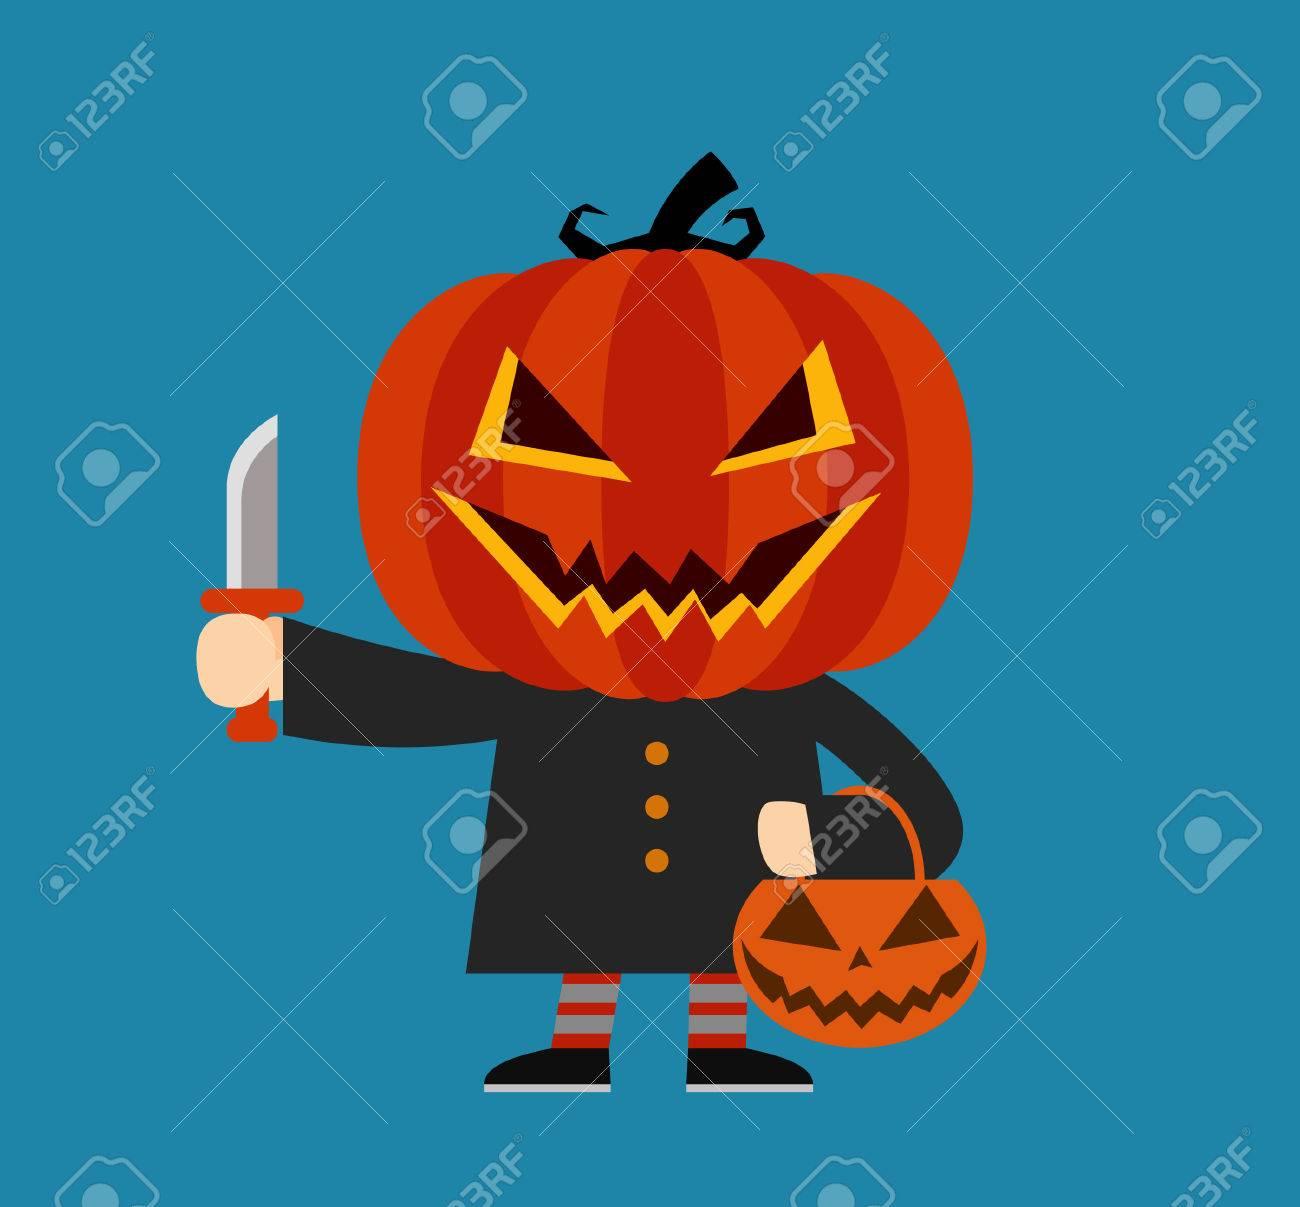 Zucche Di Halloween Cartoni Animati.Personaggio Dei Cartoni Animati Di Zucca Costume Di Halloween